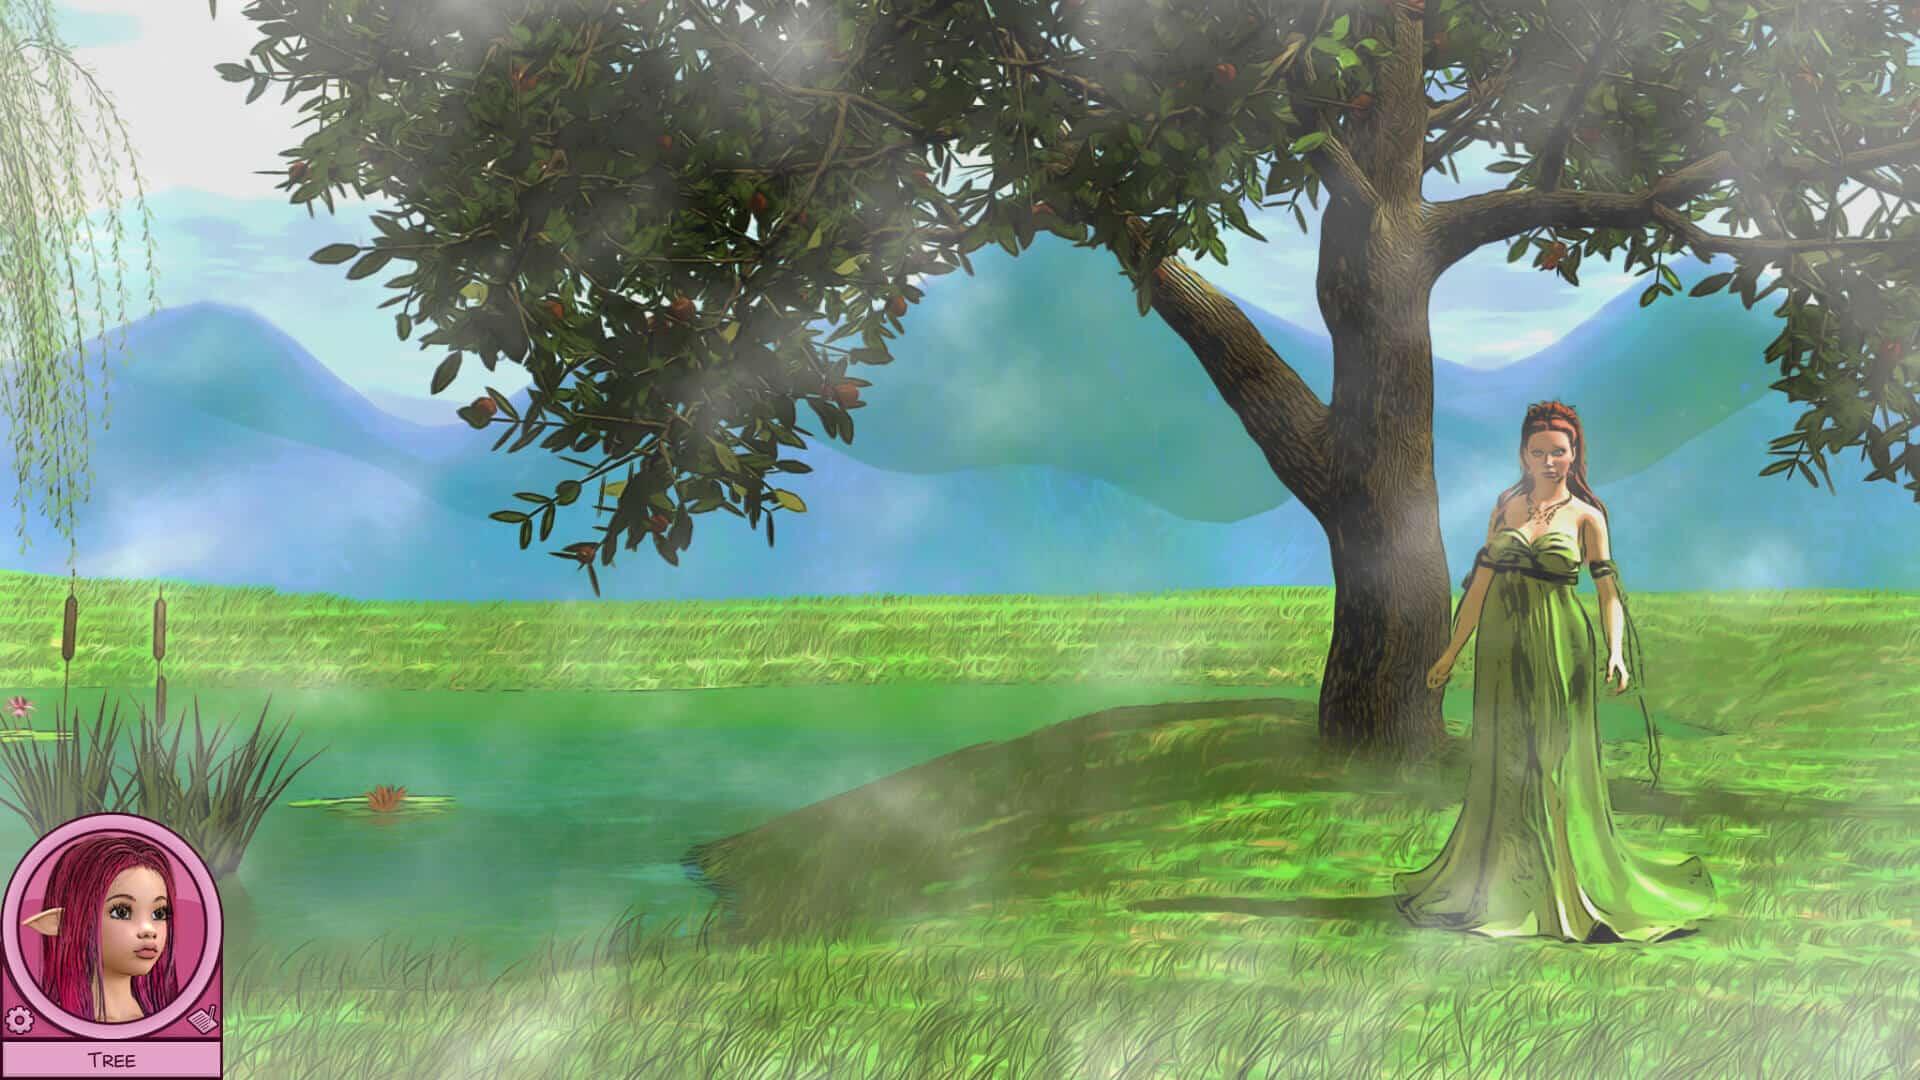 summit of the wolf adventure linux windows pc games screenshot 02